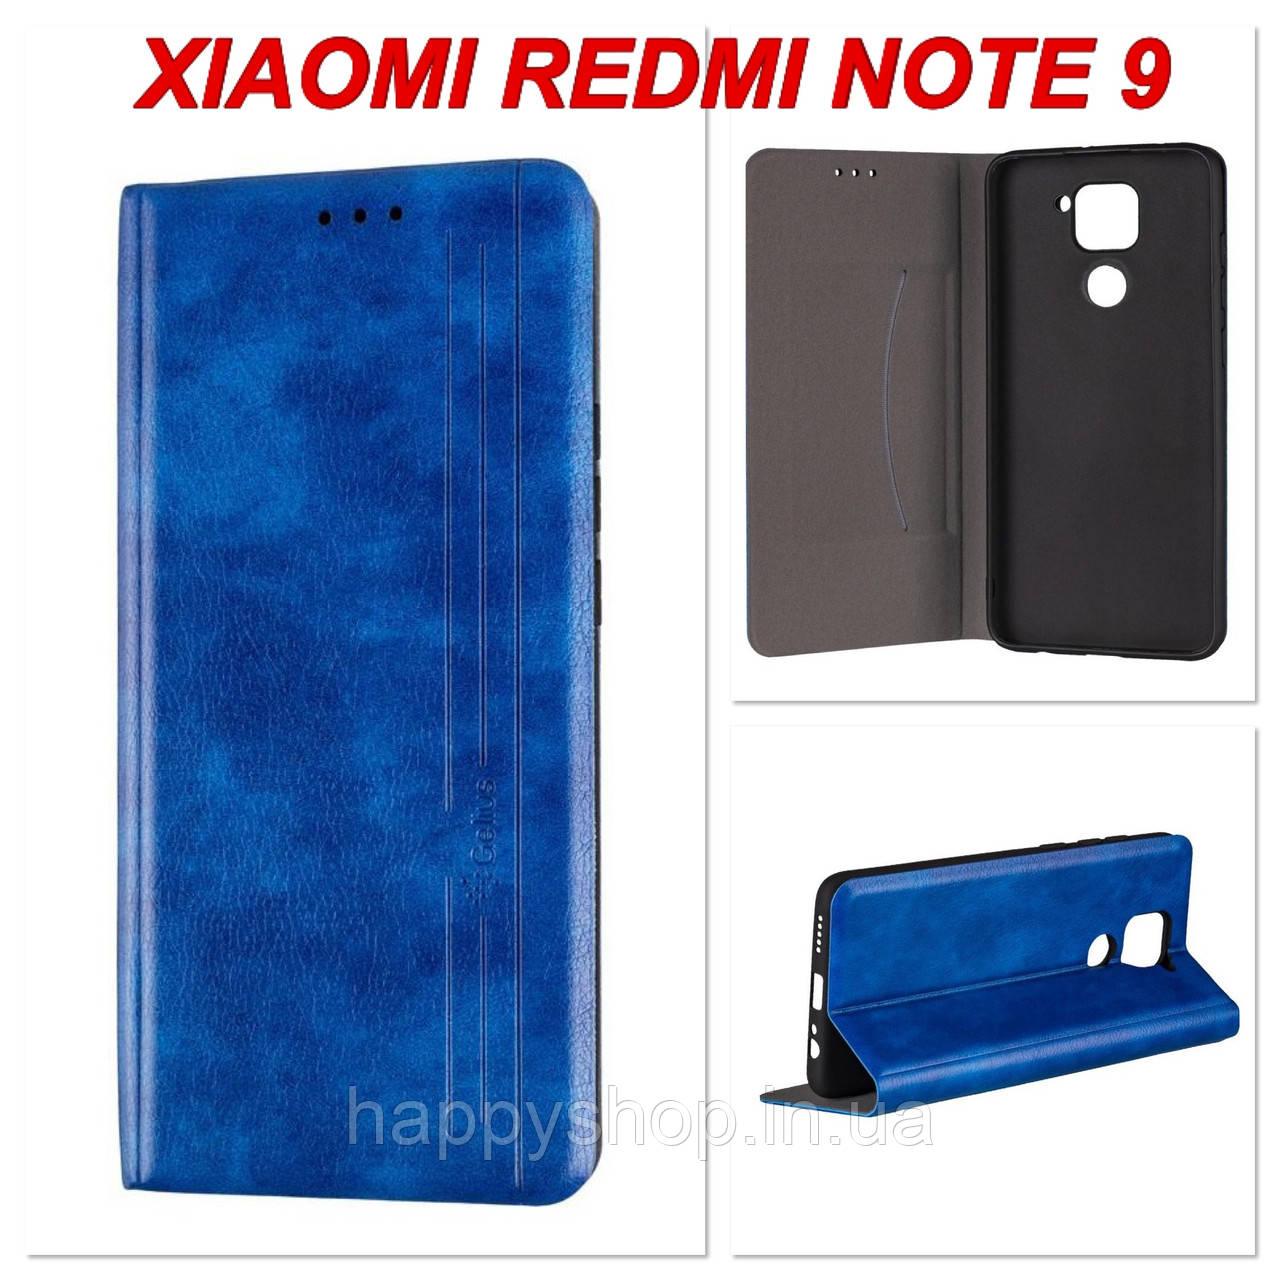 Чехол-книжка Gelius Leather New для Xiaomi Redmi Note 9 (Синий)